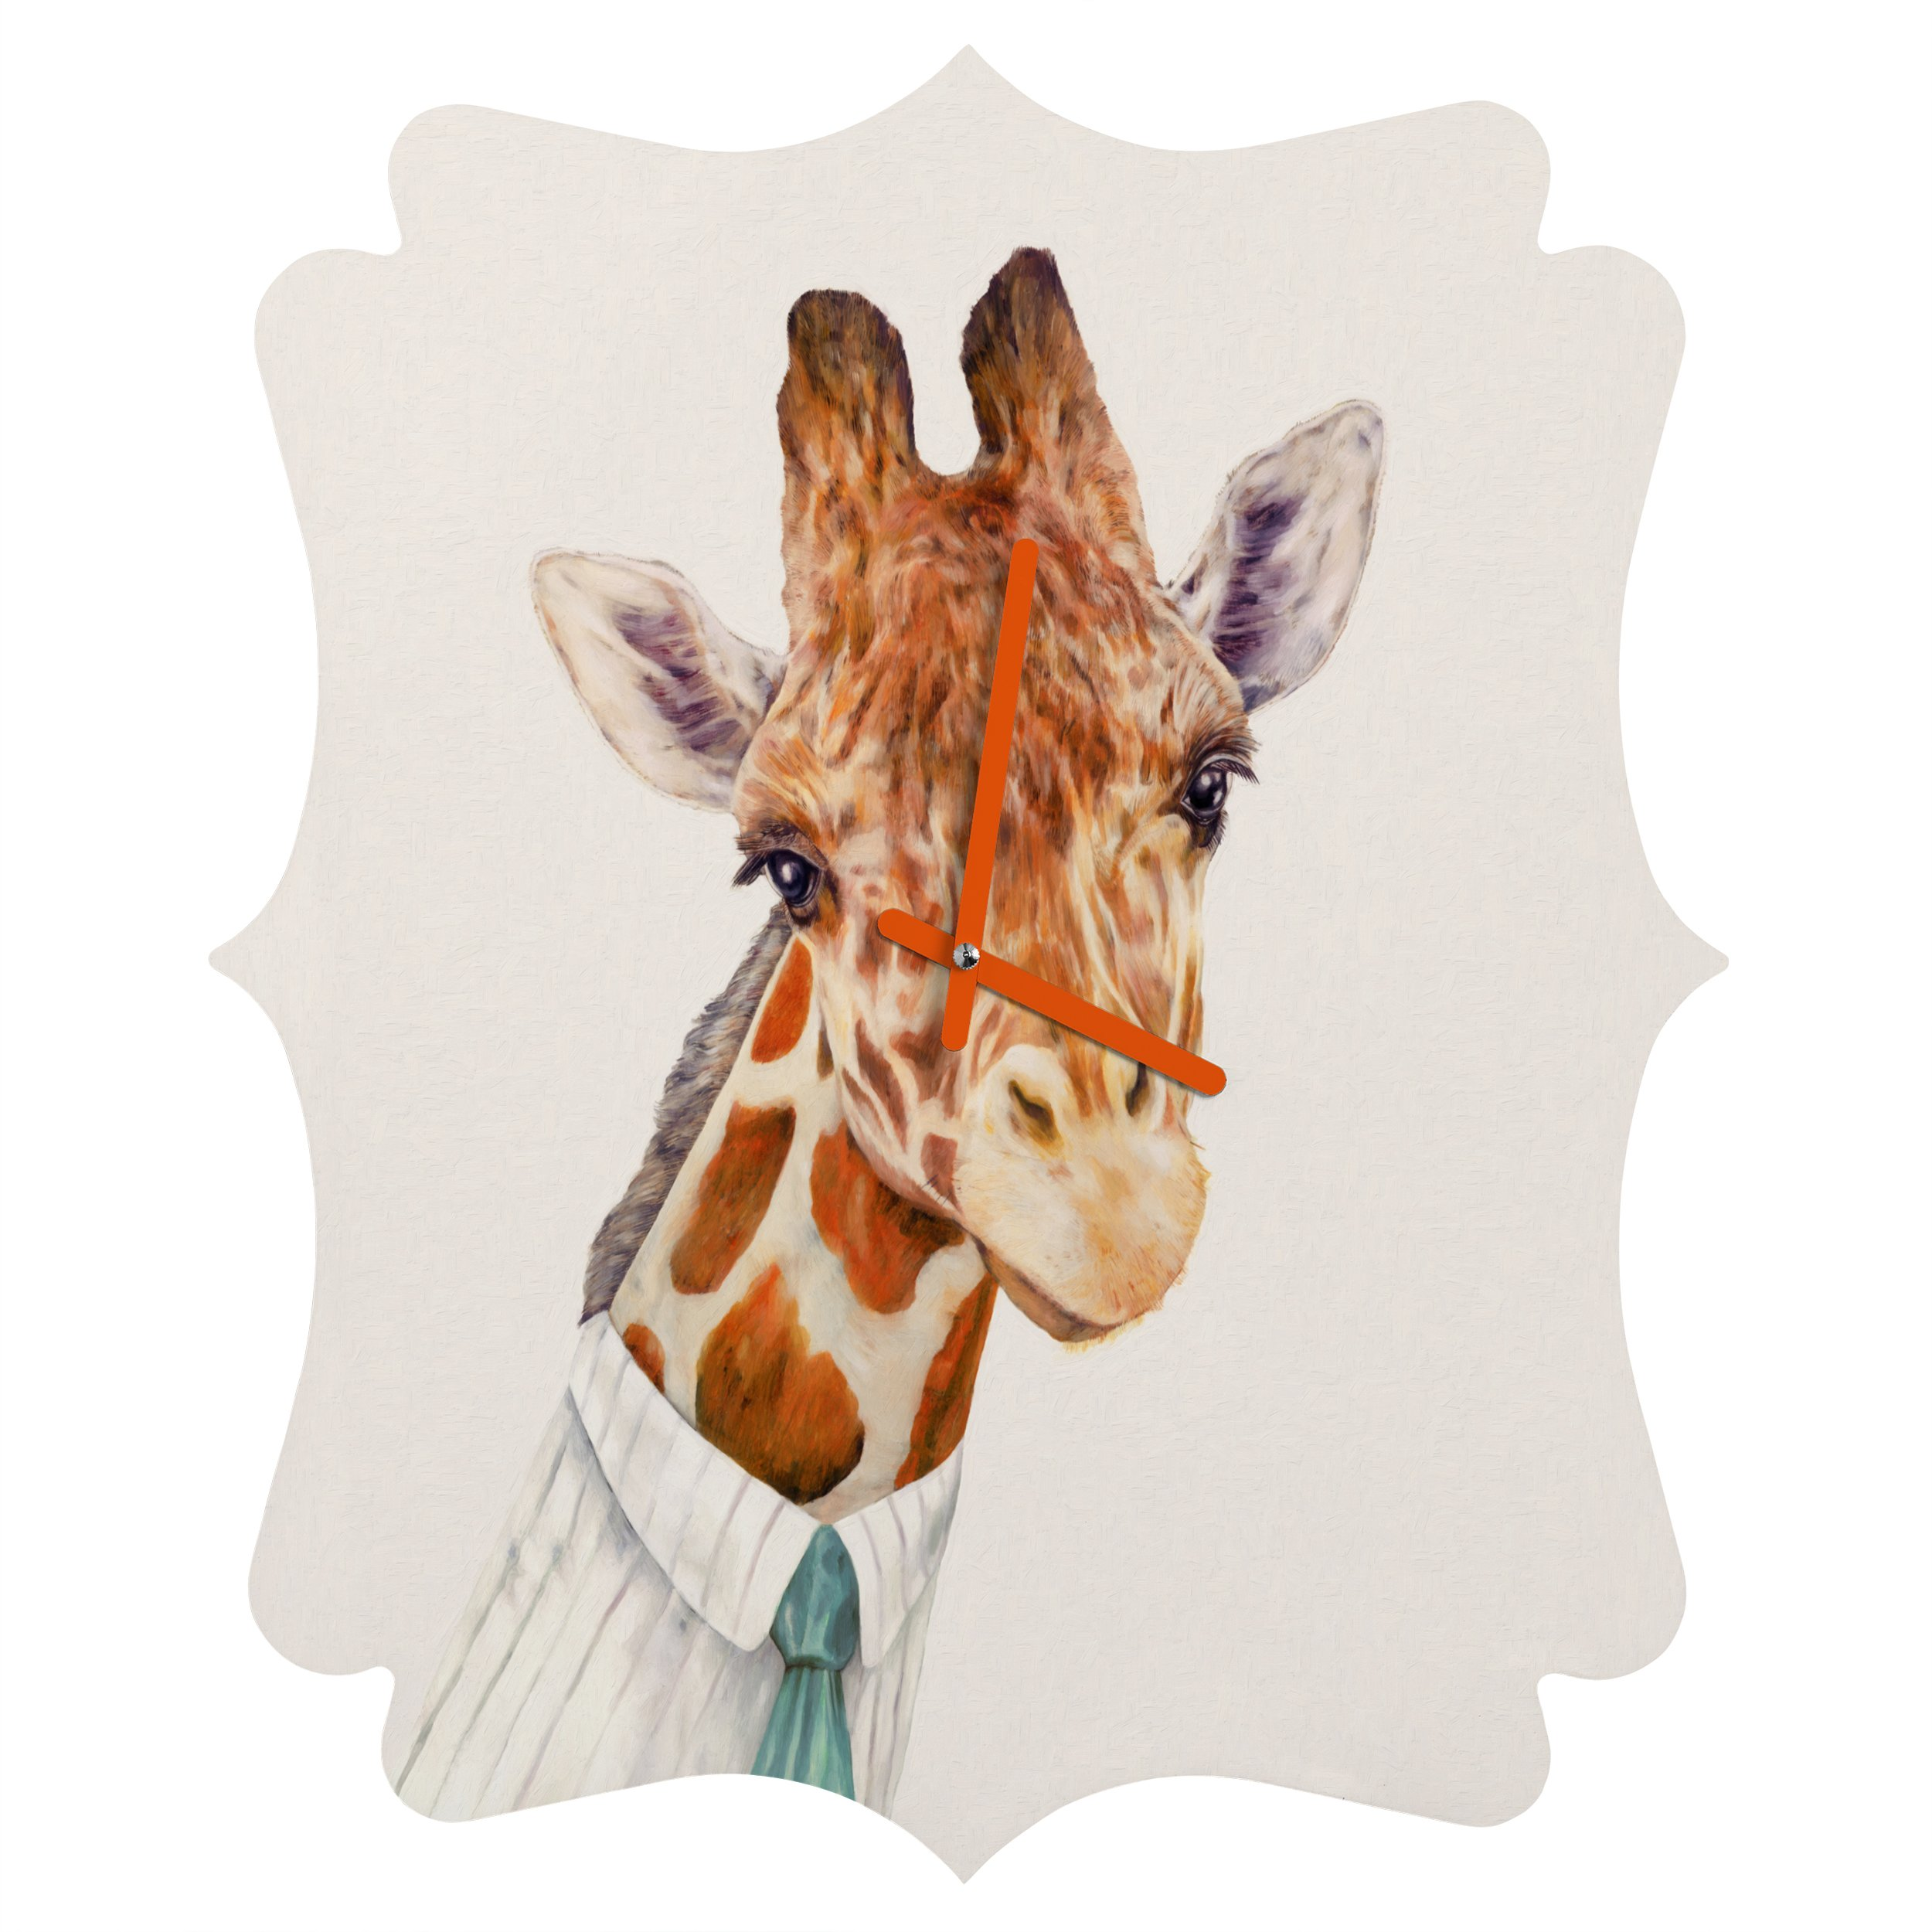 Deny Designs Animal Crew, Mr.Giraffe, Quatrefoil Clock, Small